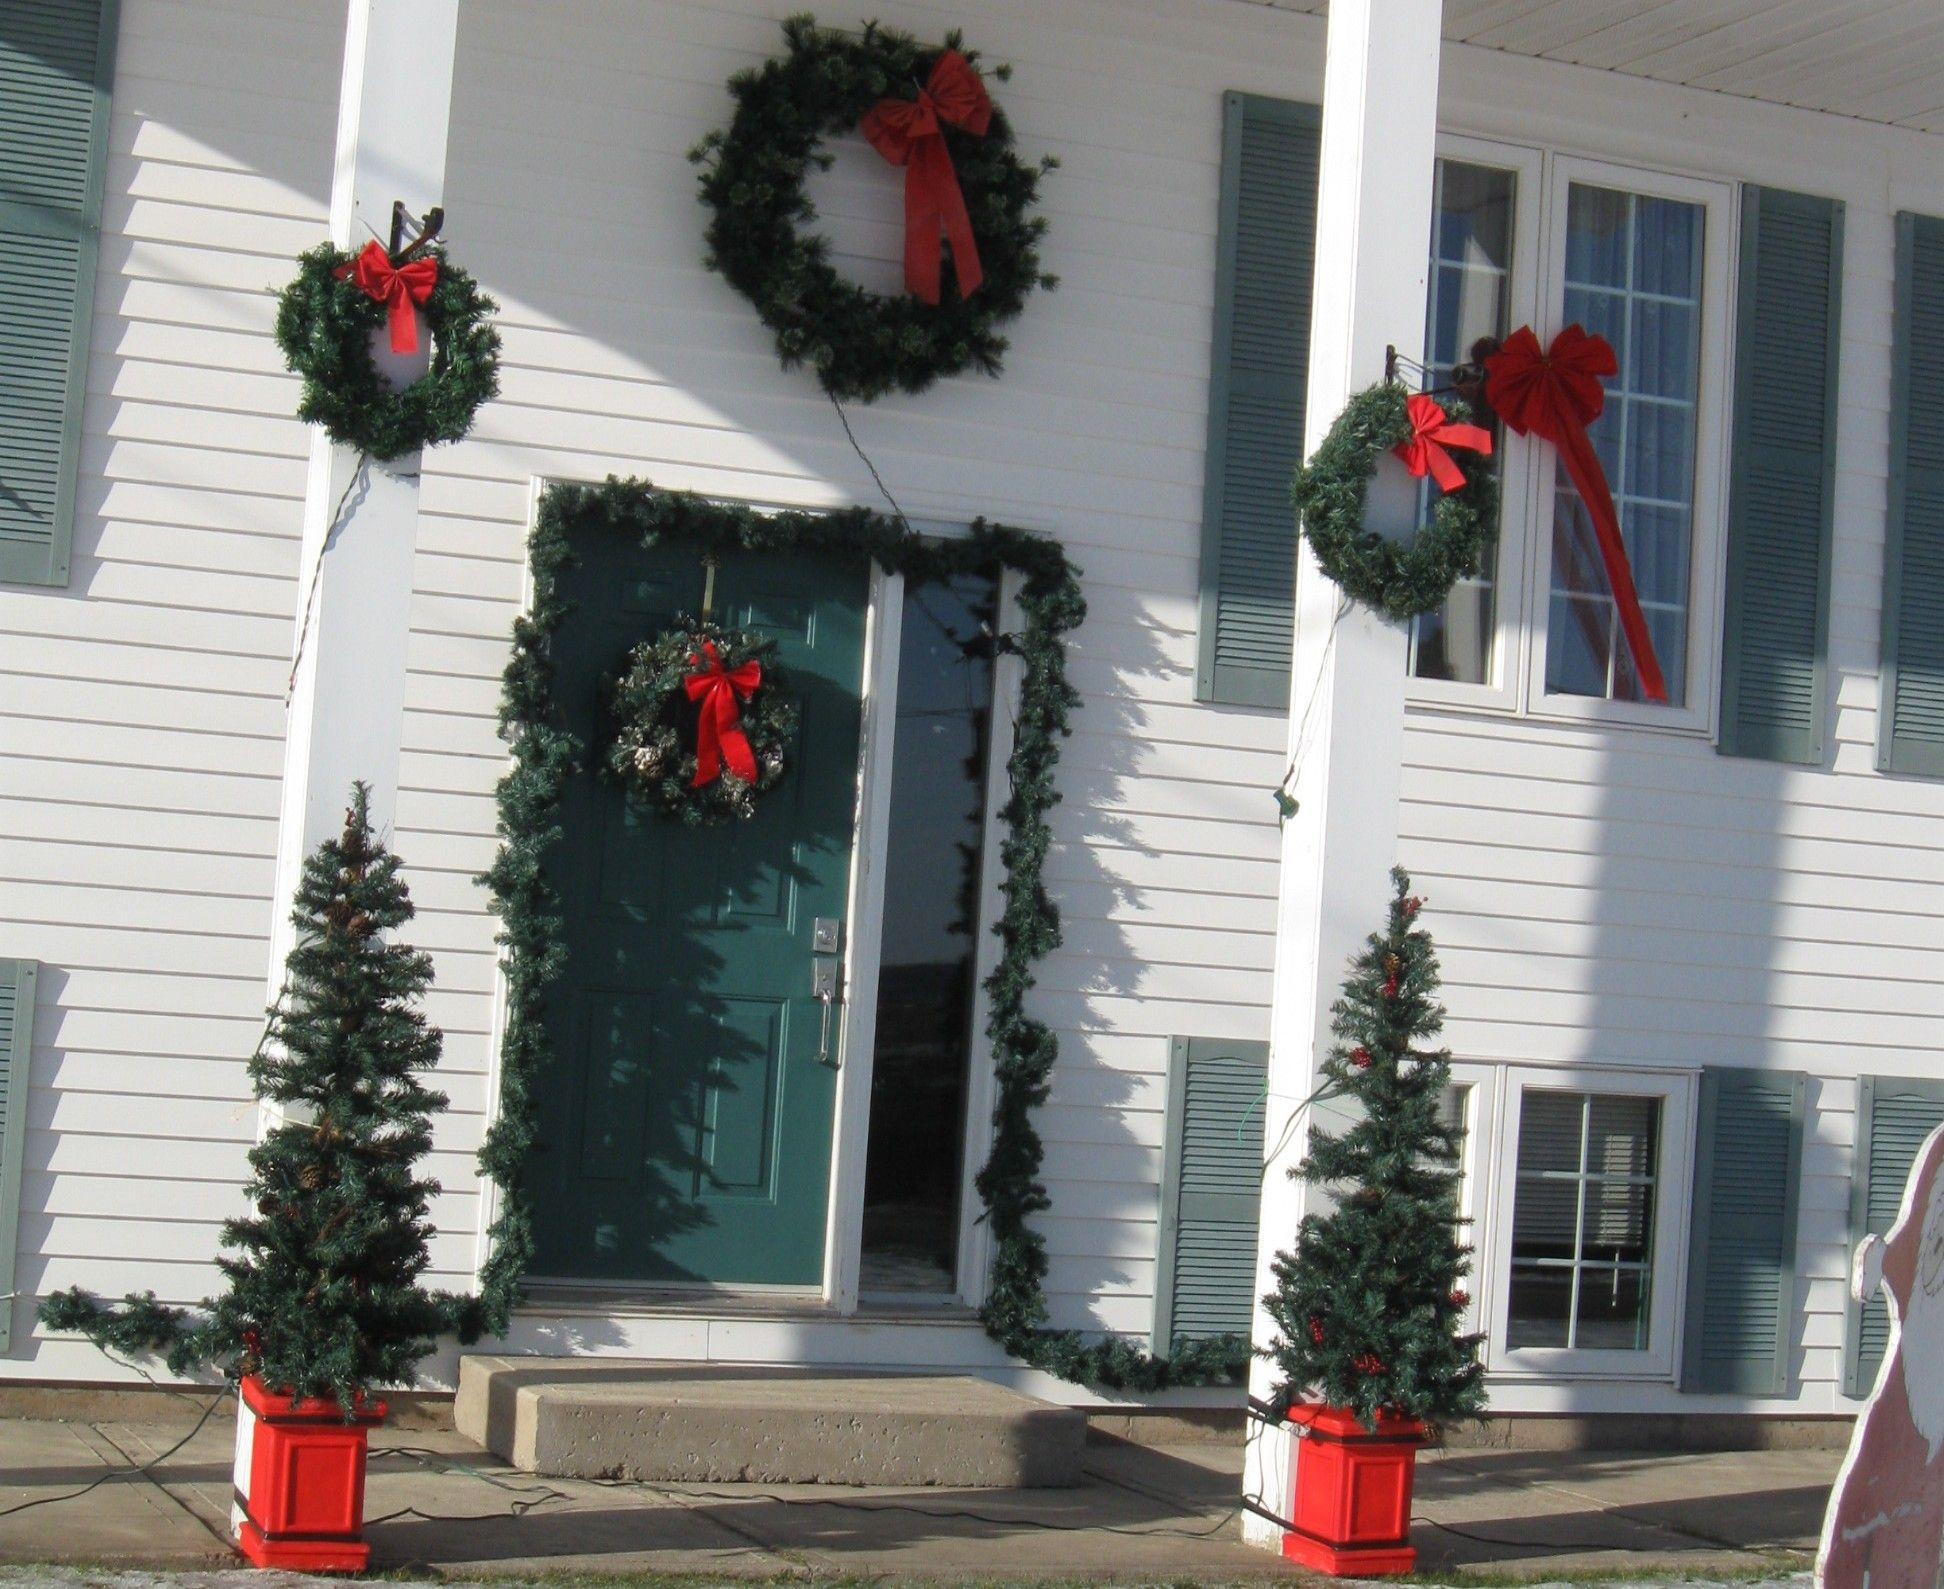 House in Antigonish, Nova Scotia, Canada sporting ...